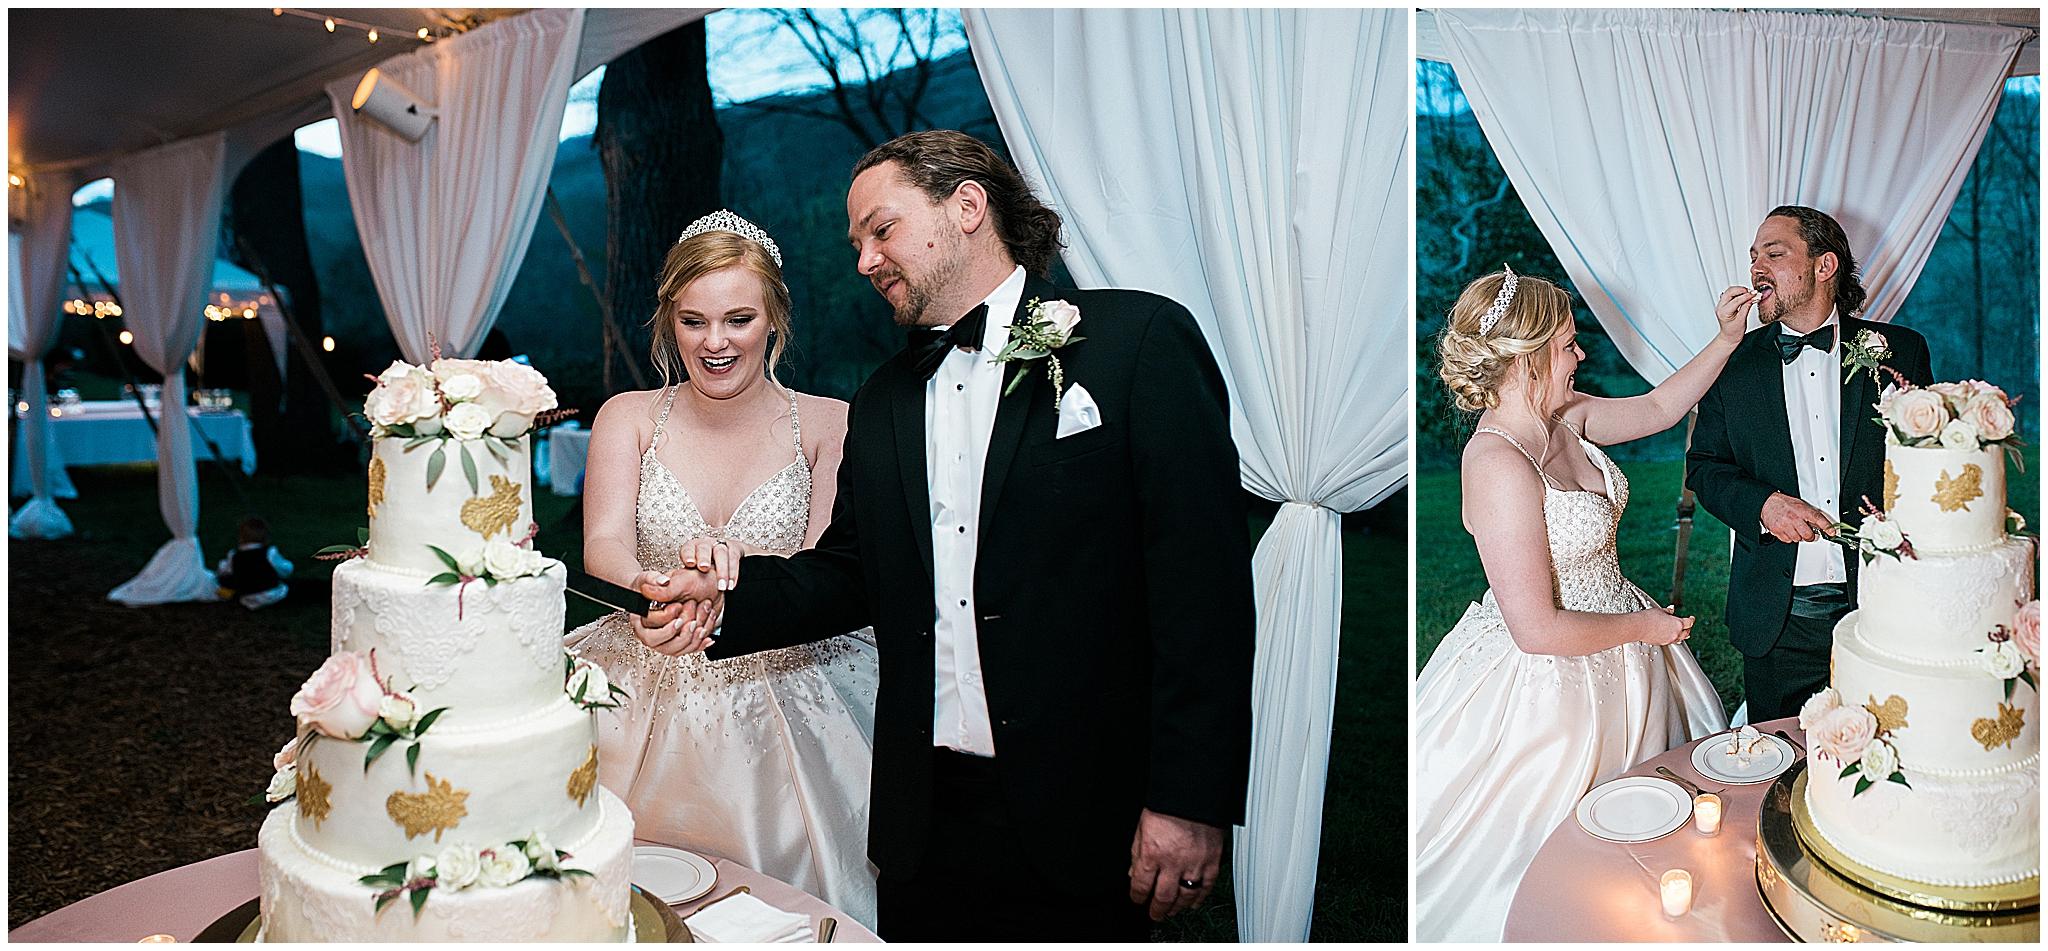 Wedding_Photographers_Asheville_Mountain_Magnolia_Inn_0024.jpg